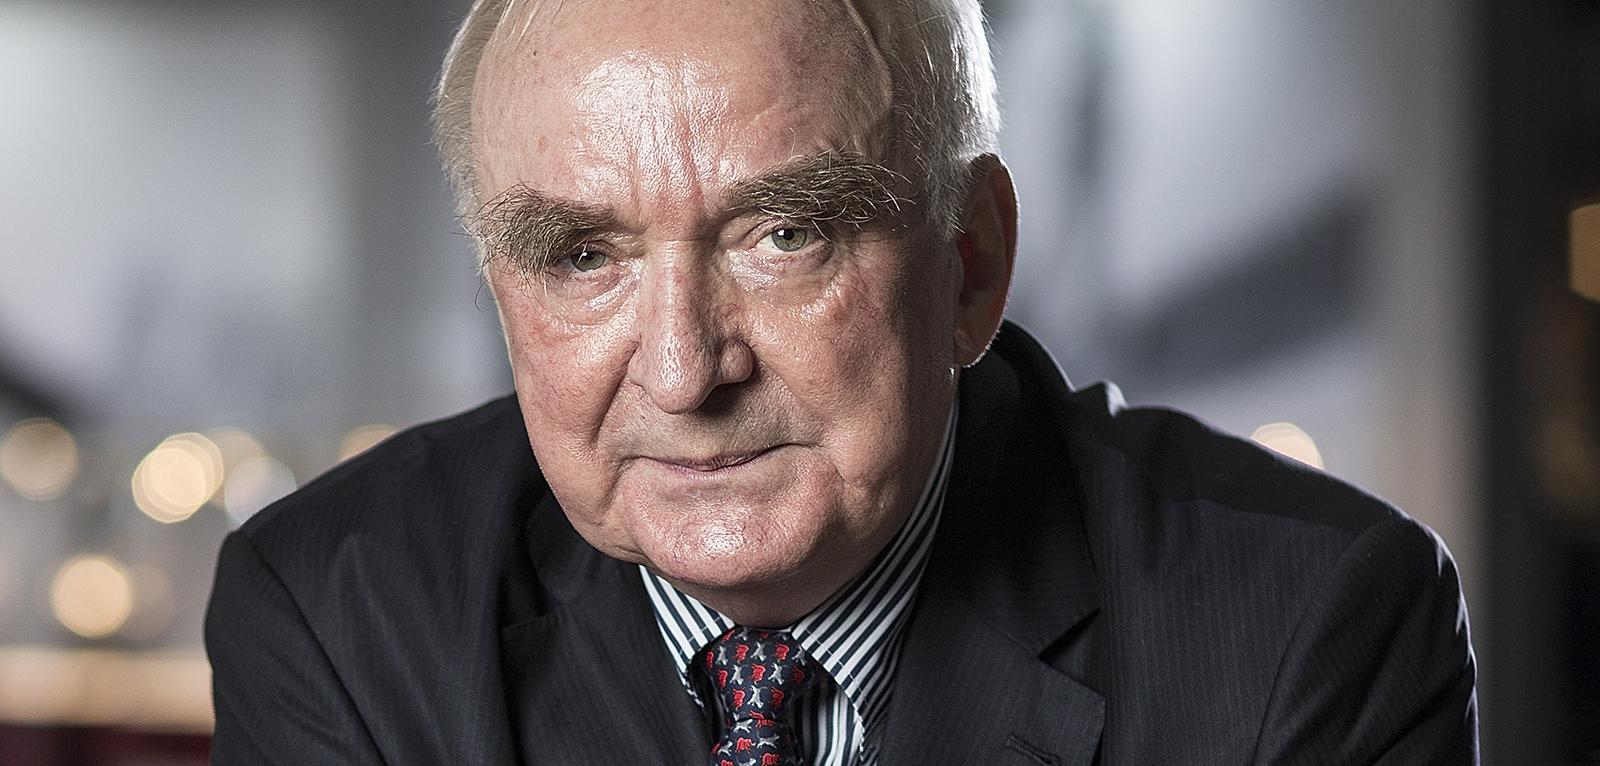 Walter von Kanel, president of Longines